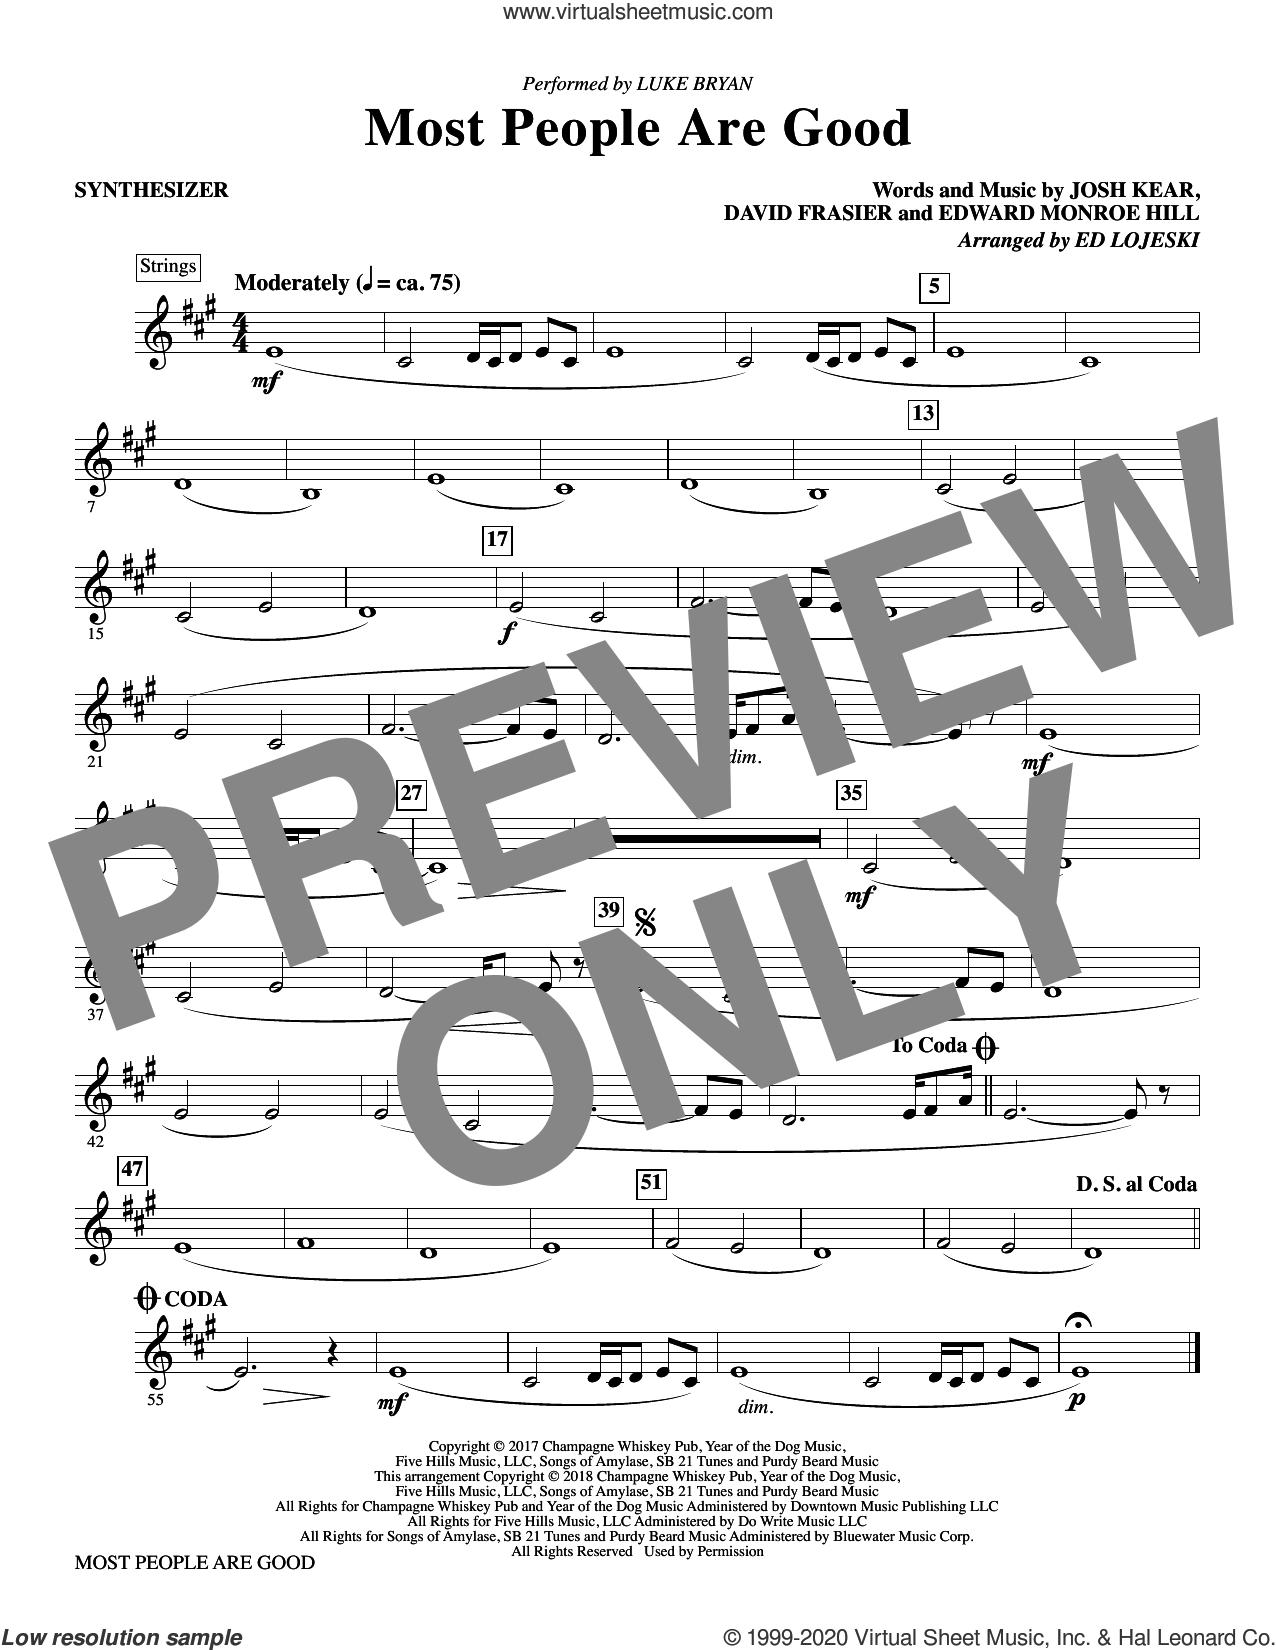 Most People Are Good  (arr. Ed Lojeski) sheet music for orchestra/band (synthesizer) by Luke Bryan, Ed Lojeski, David Frasier, Edward Monroe Hill and Josh Kear, intermediate skill level